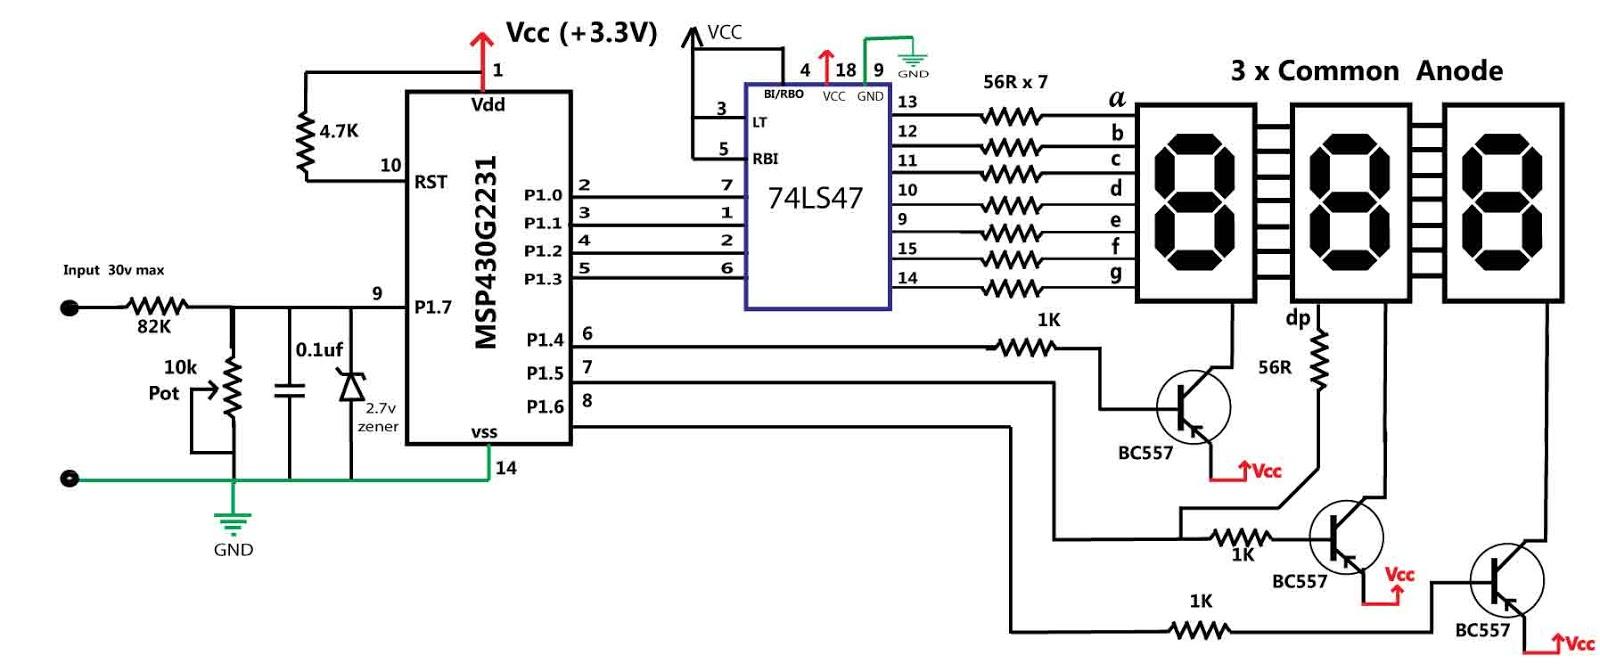 wiring diagram symbols for display wiring diagram progresifdisplay voltmeter schematic detailed data wiring diagram printable industrial [ 1600 x 672 Pixel ]